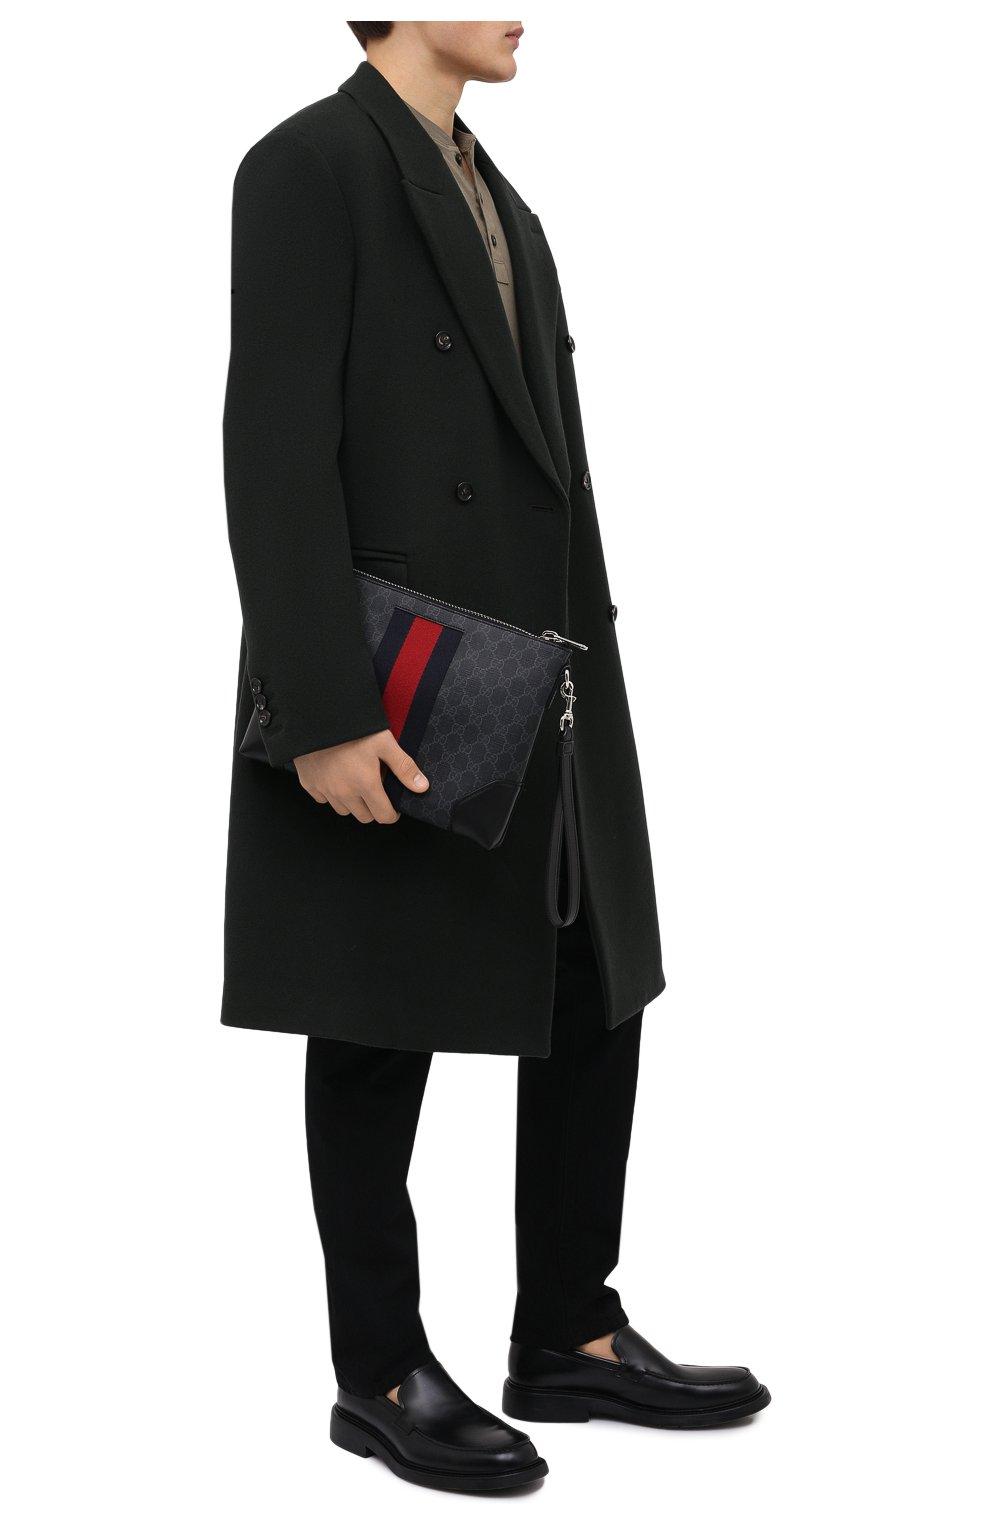 590e4c23b293 Мужские сумки Gucci по цене от 39 500 руб. купить в интернет-магазине ЦУМ